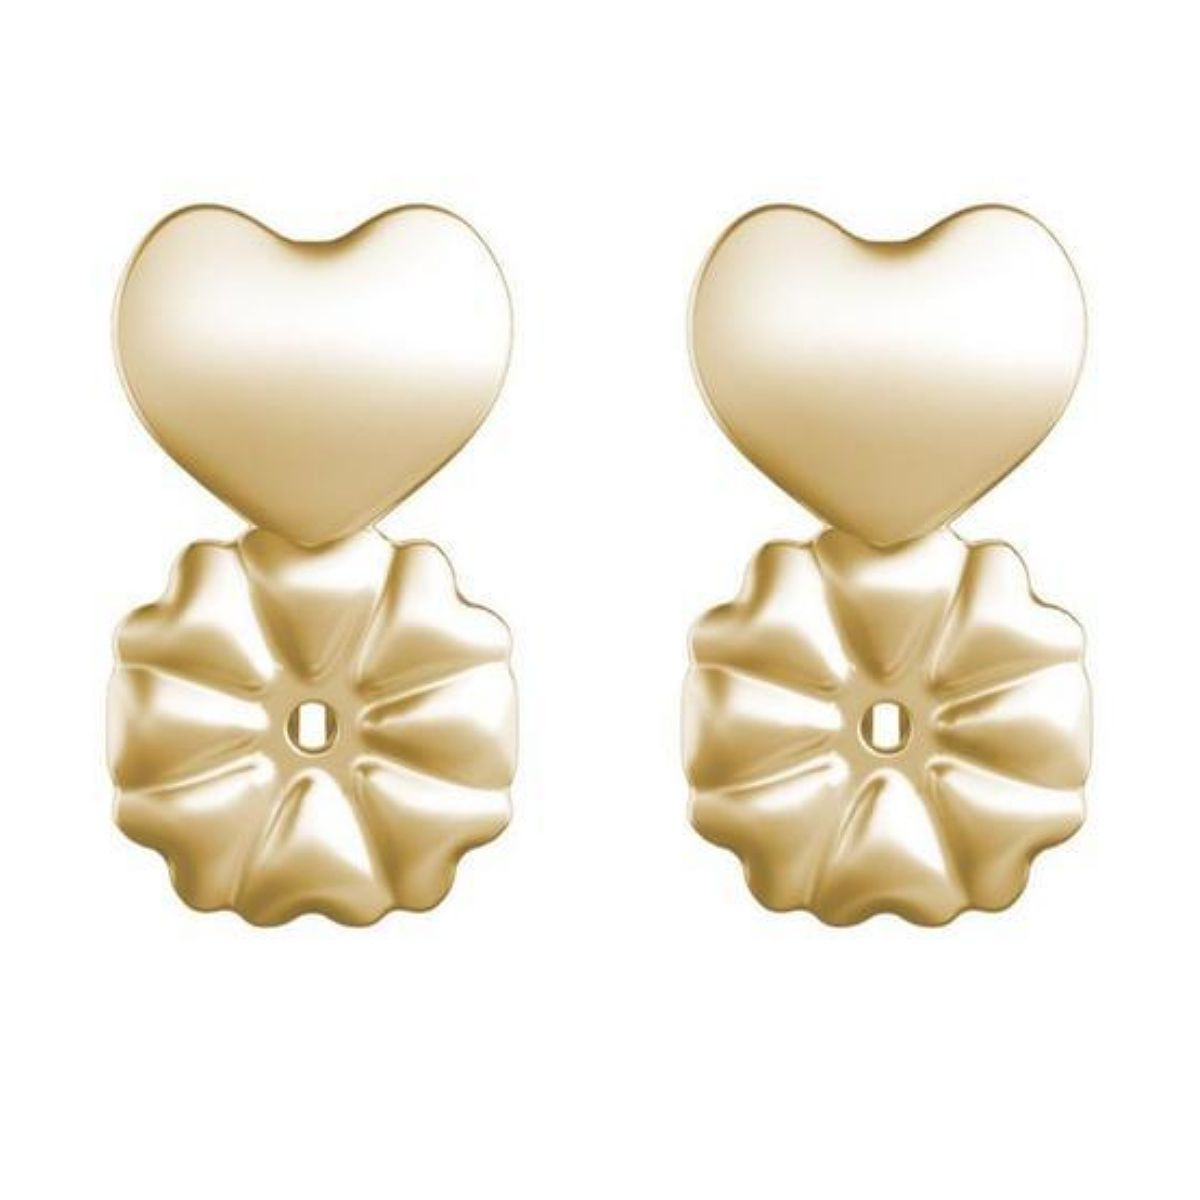 Ear Cuff Palito Curvo Ouro Rosé Zircônia Branca Semijoia  - Soloyou